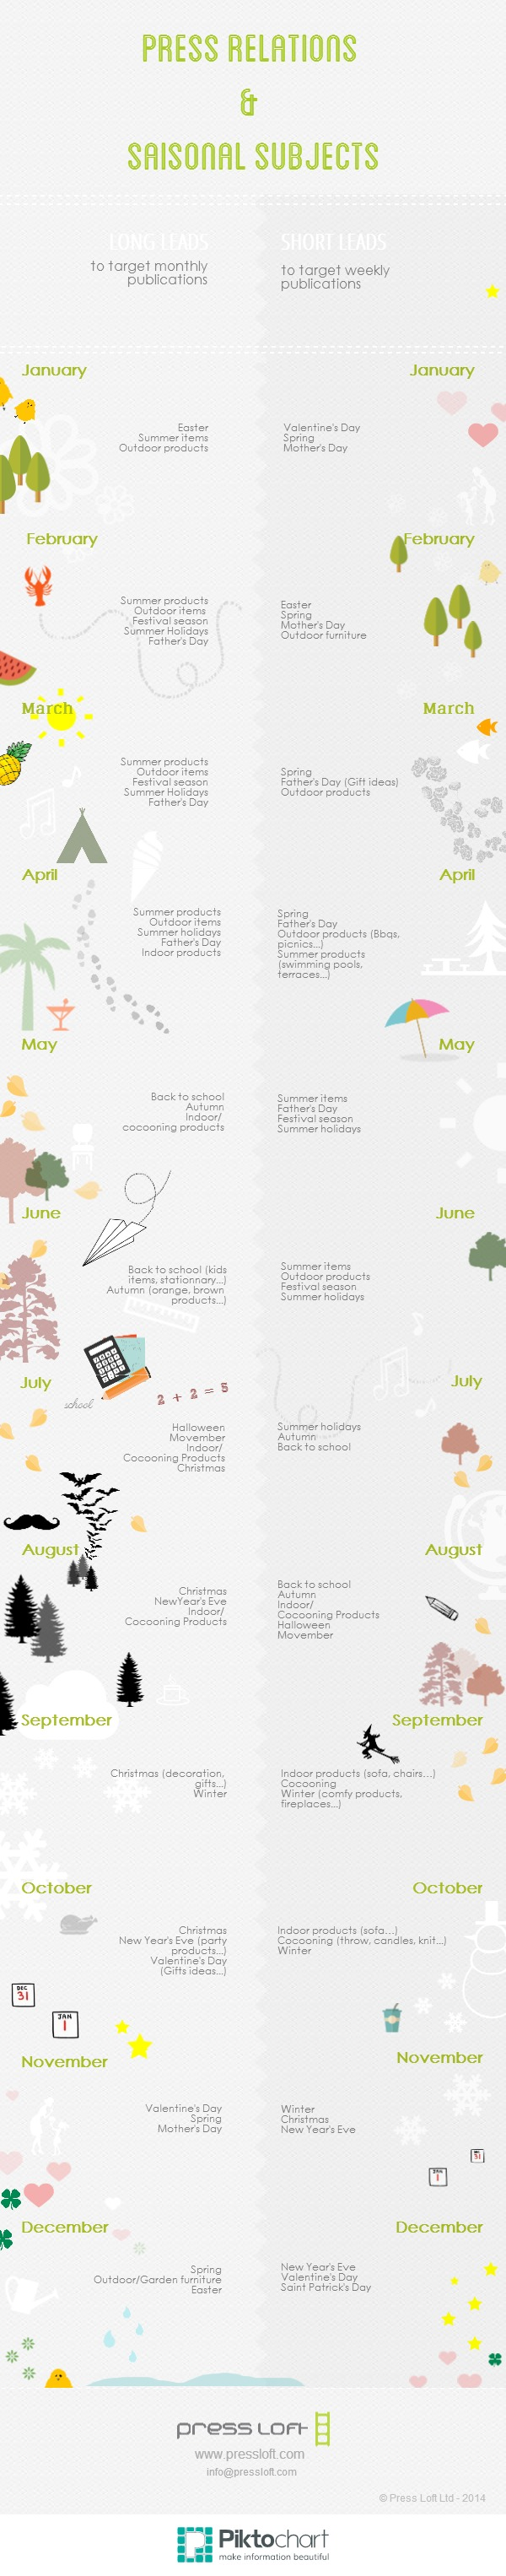 PR & seasonal subjects